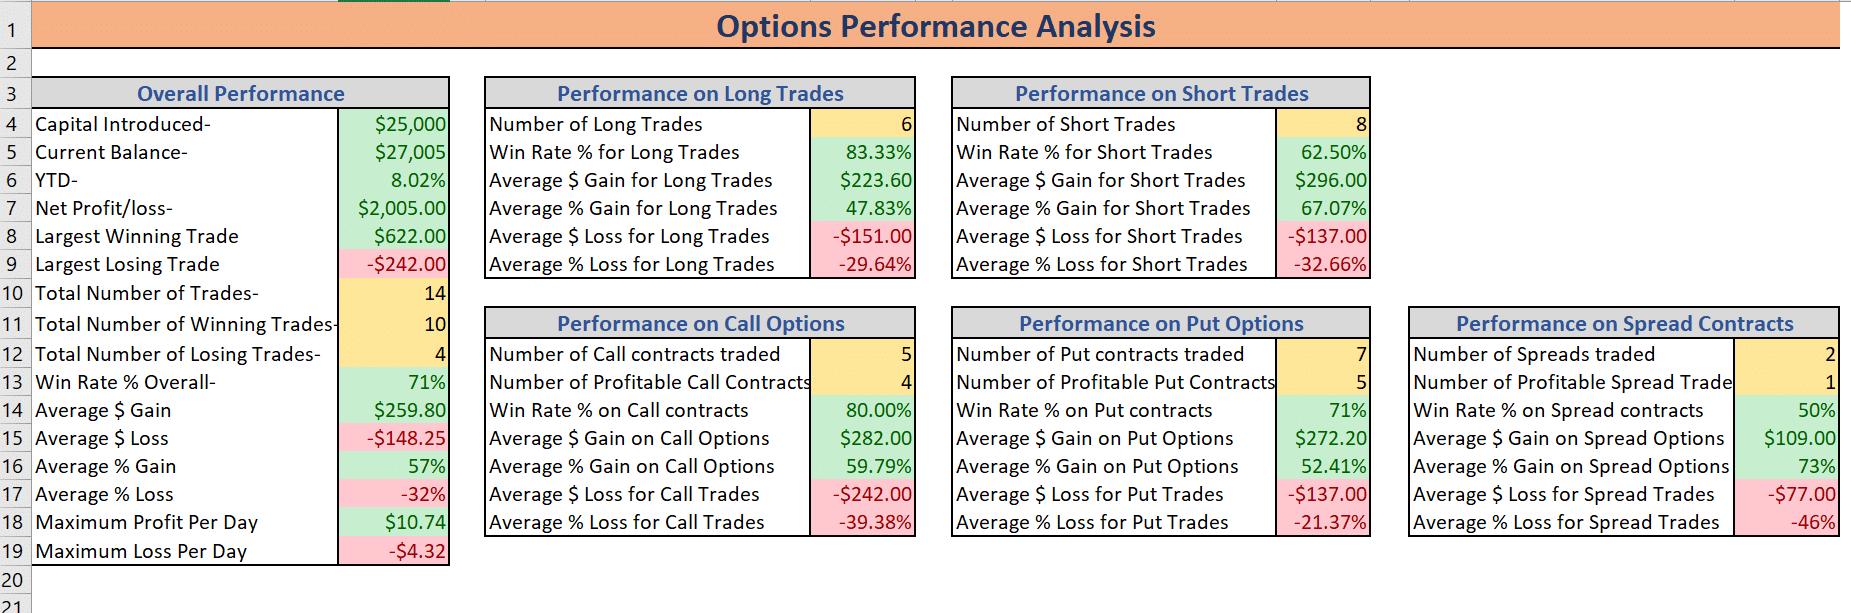 Options performance analysis